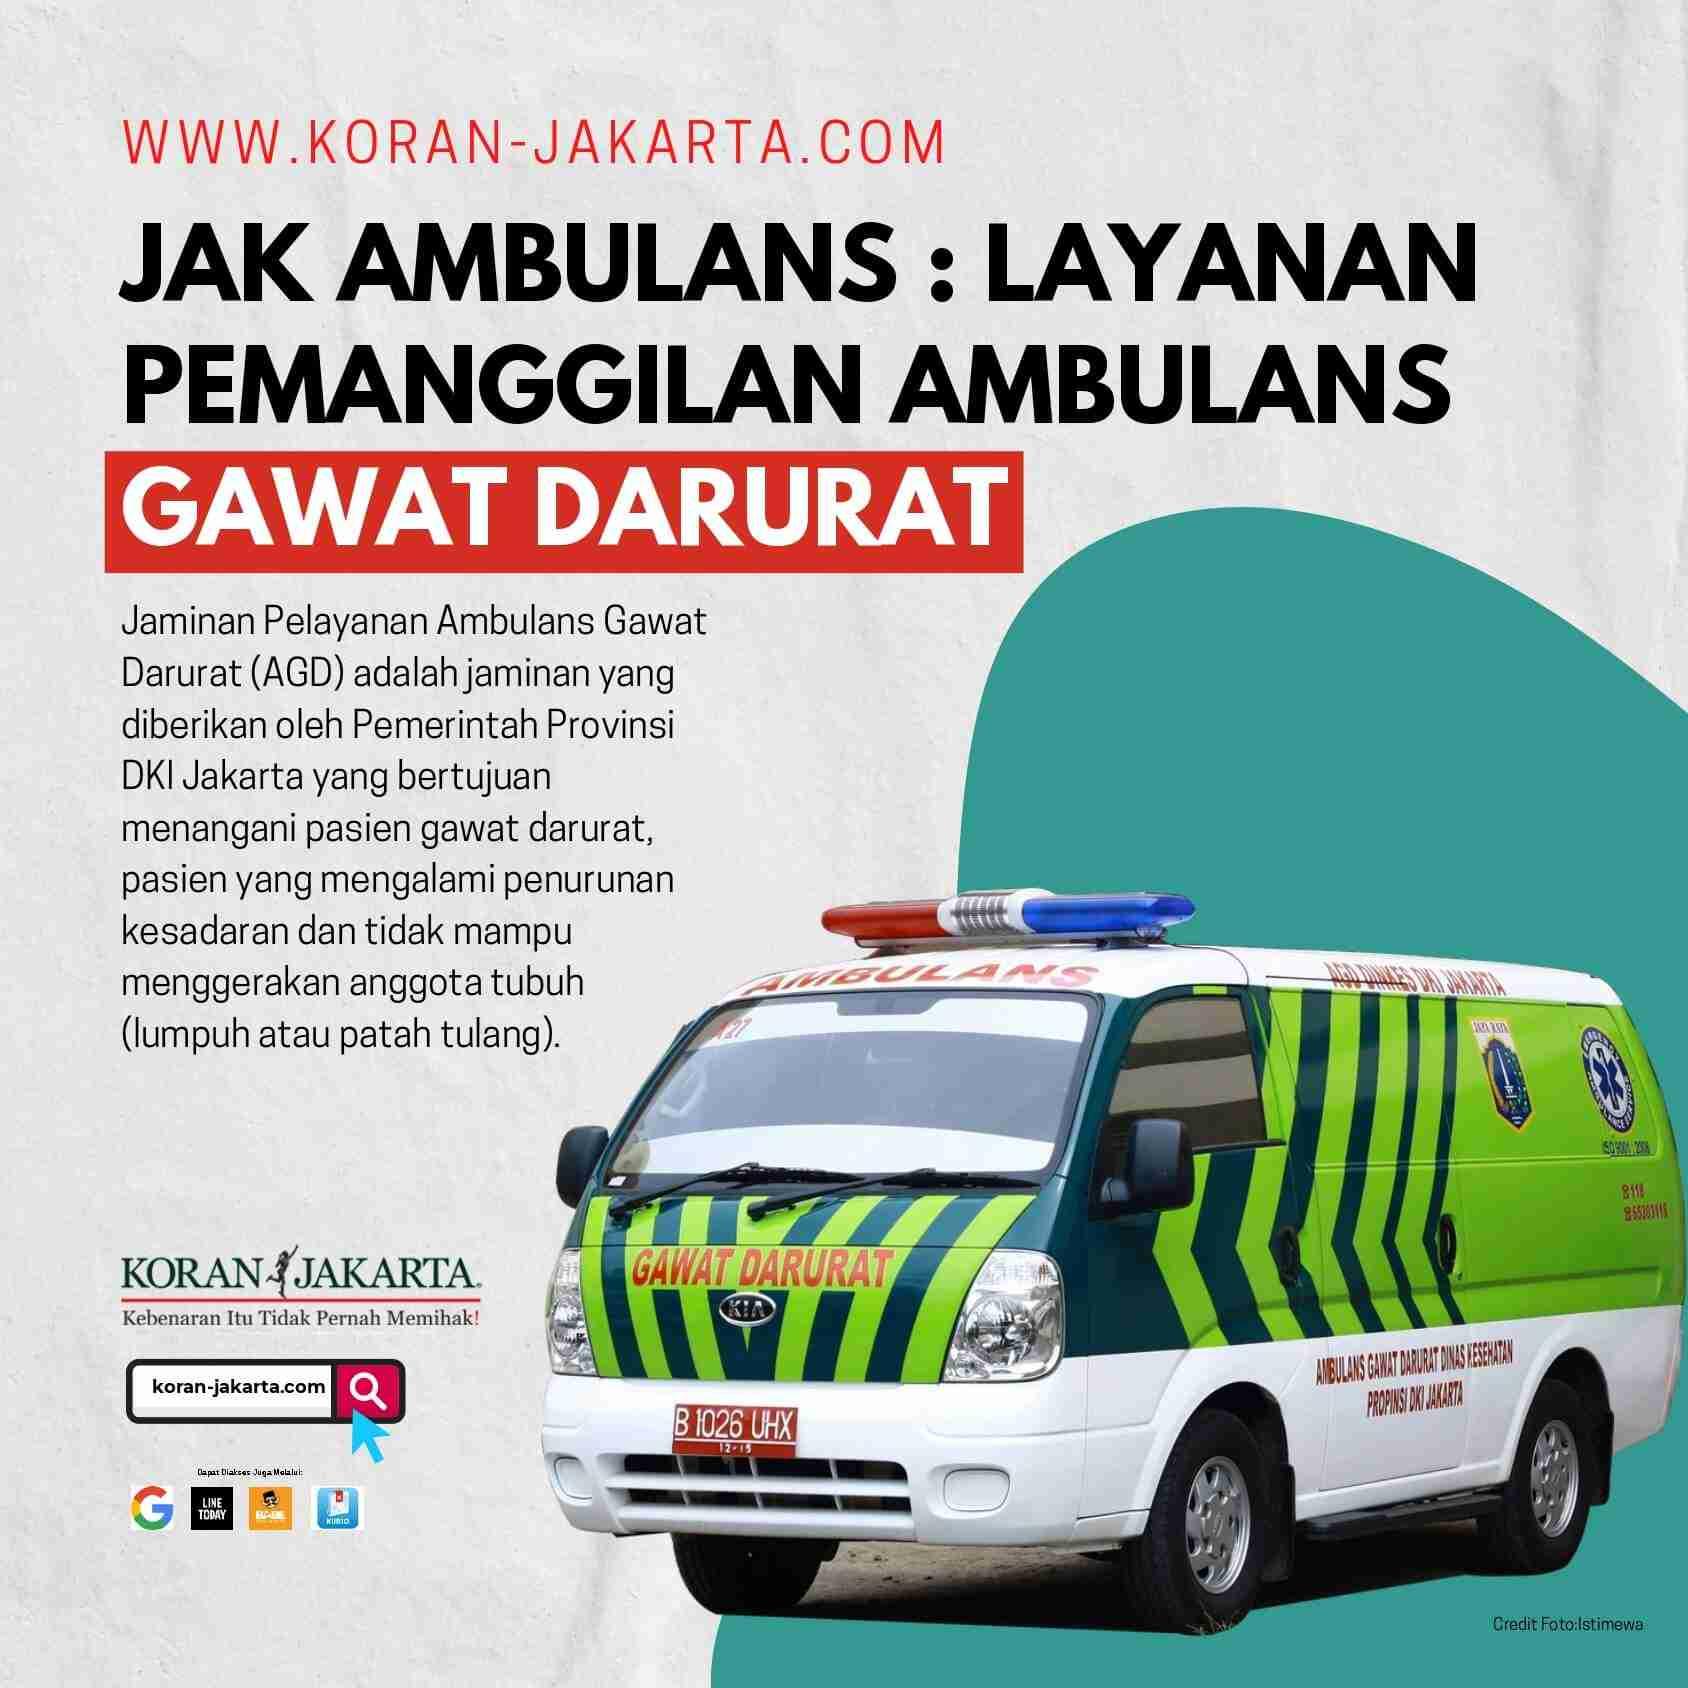 Jak Ambulans : Layanan Pemanggilan Ambulans Gawat Darurat